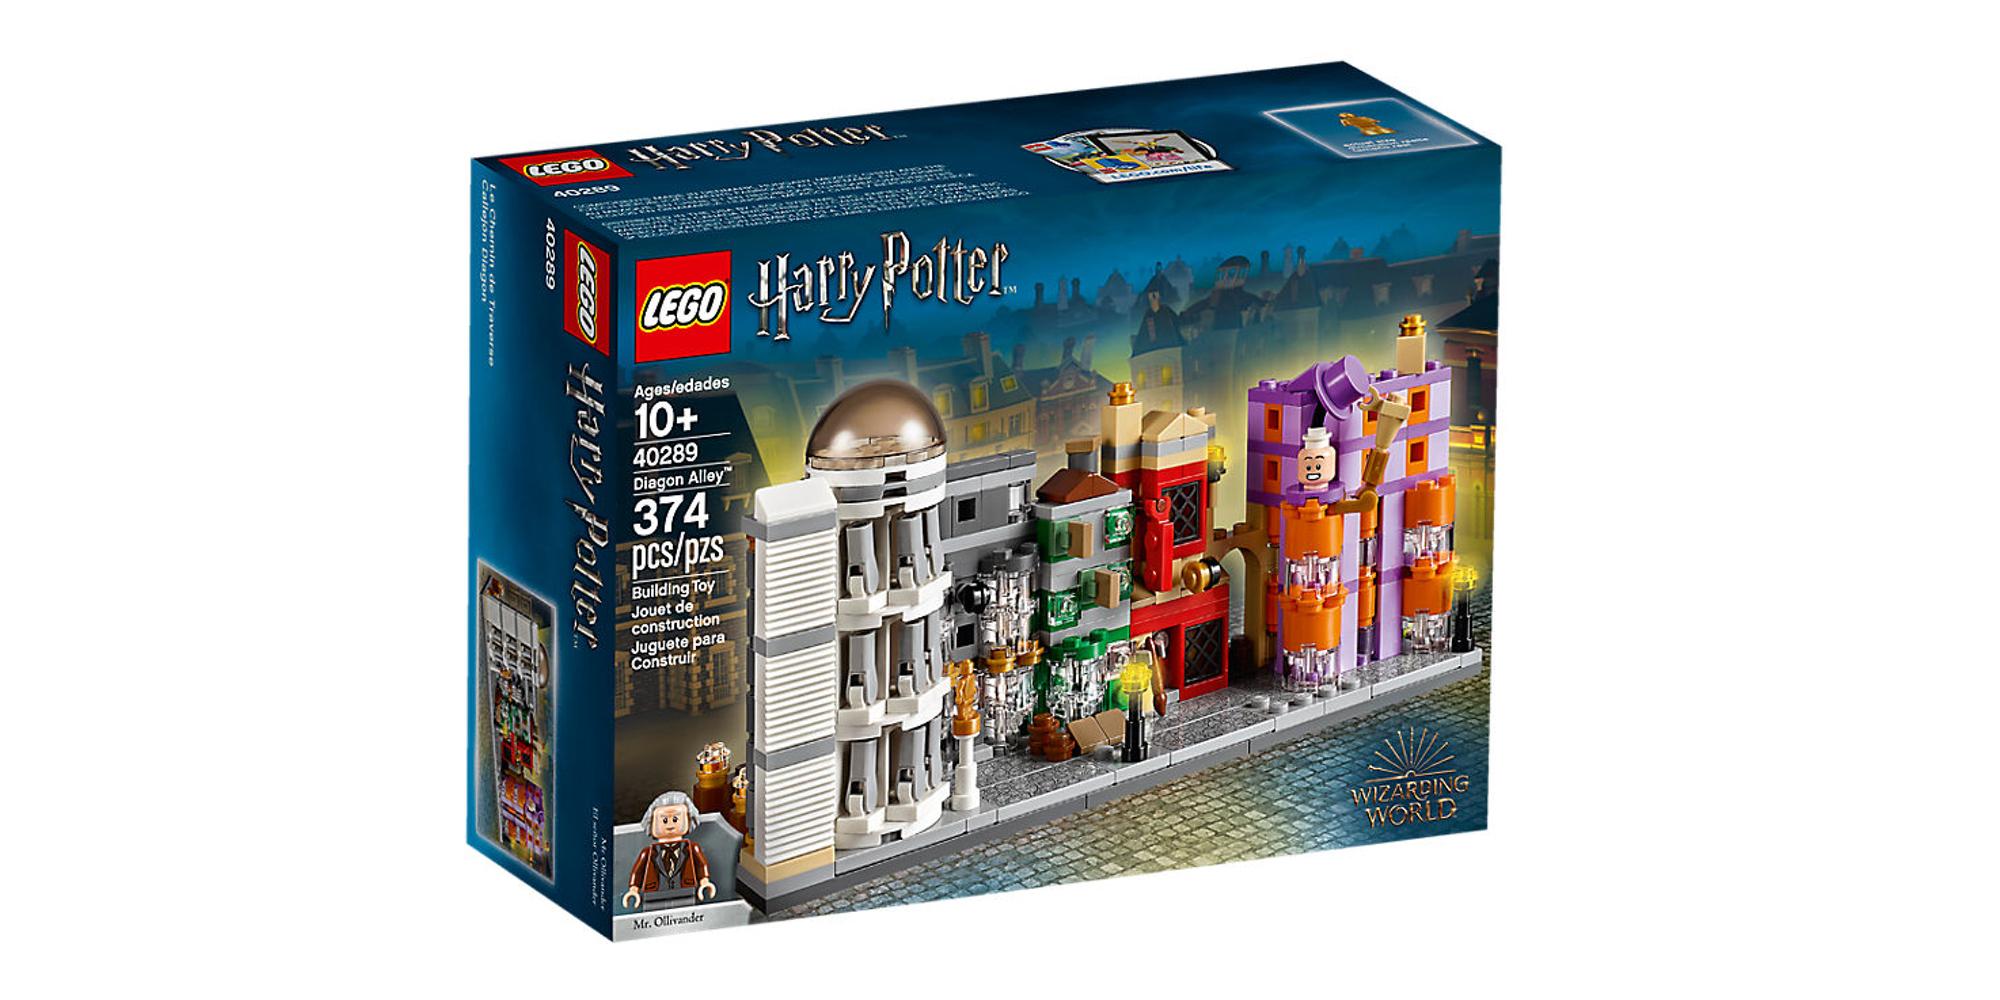 LEGODiagon Alley Box Front